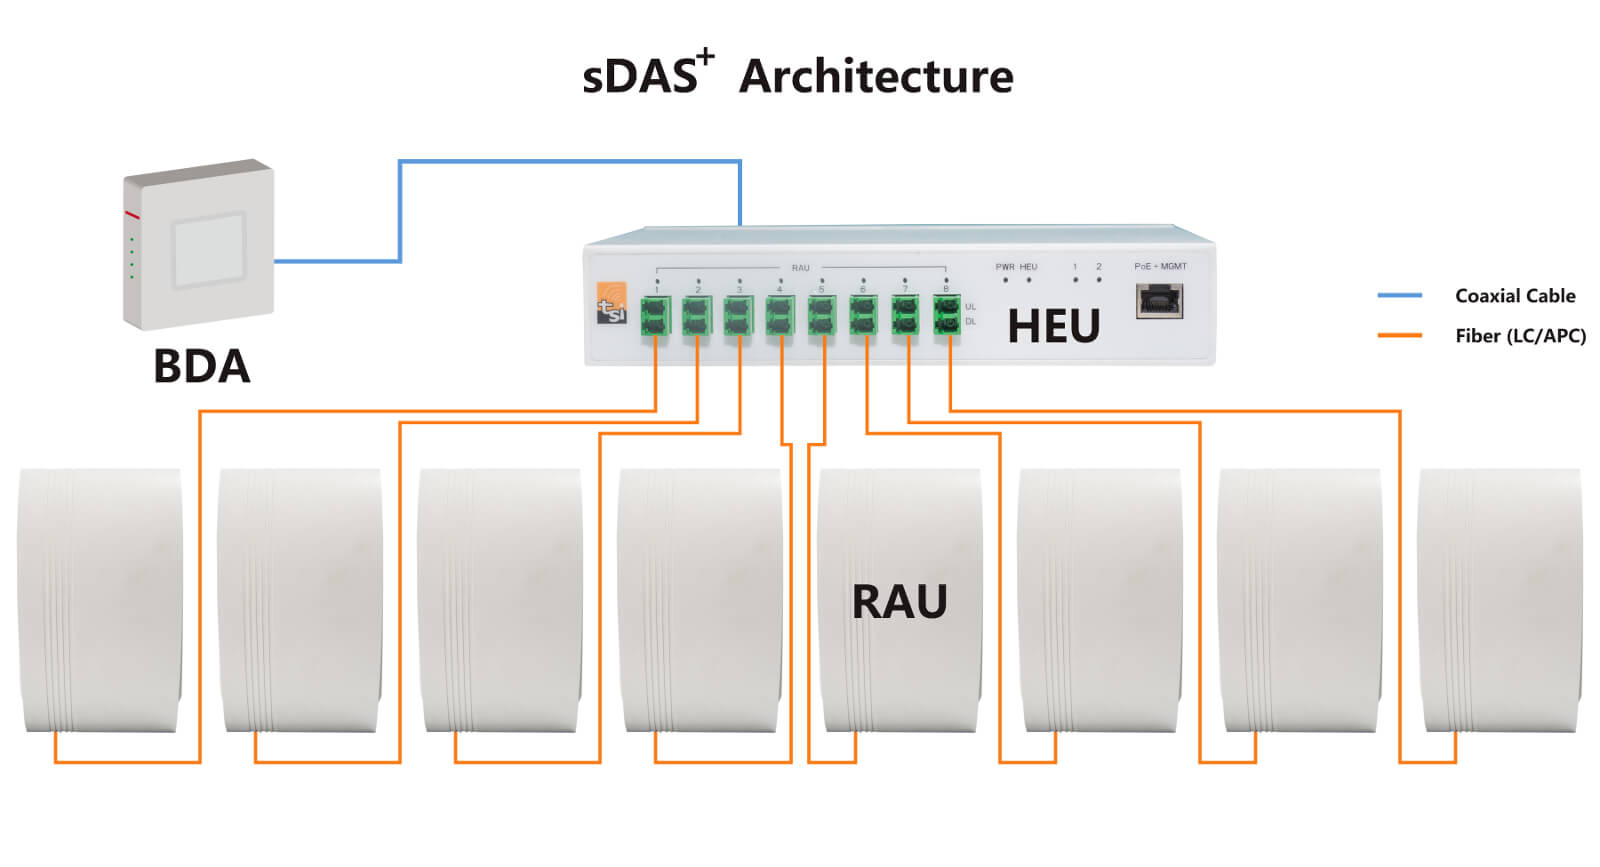 sDAS+ Distributed Antenna System